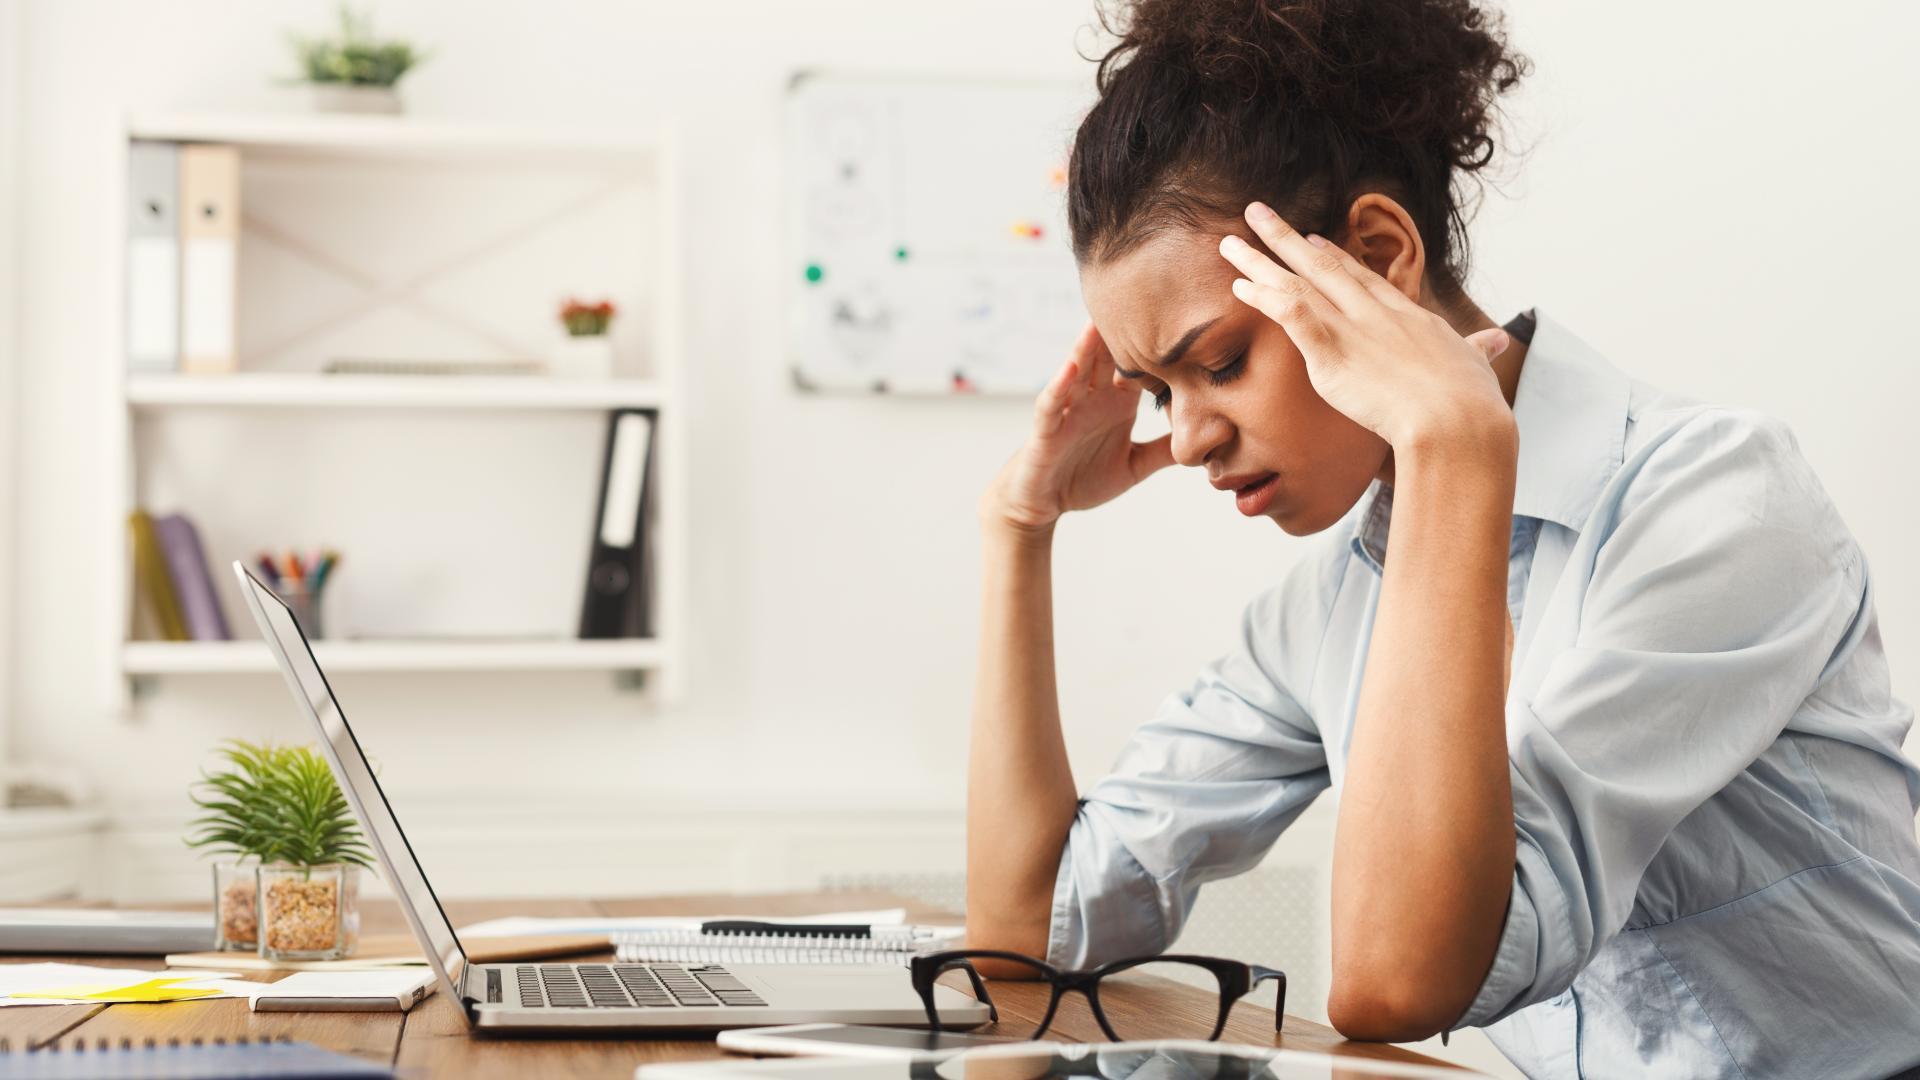 stress Arbeit Frau arbeiten